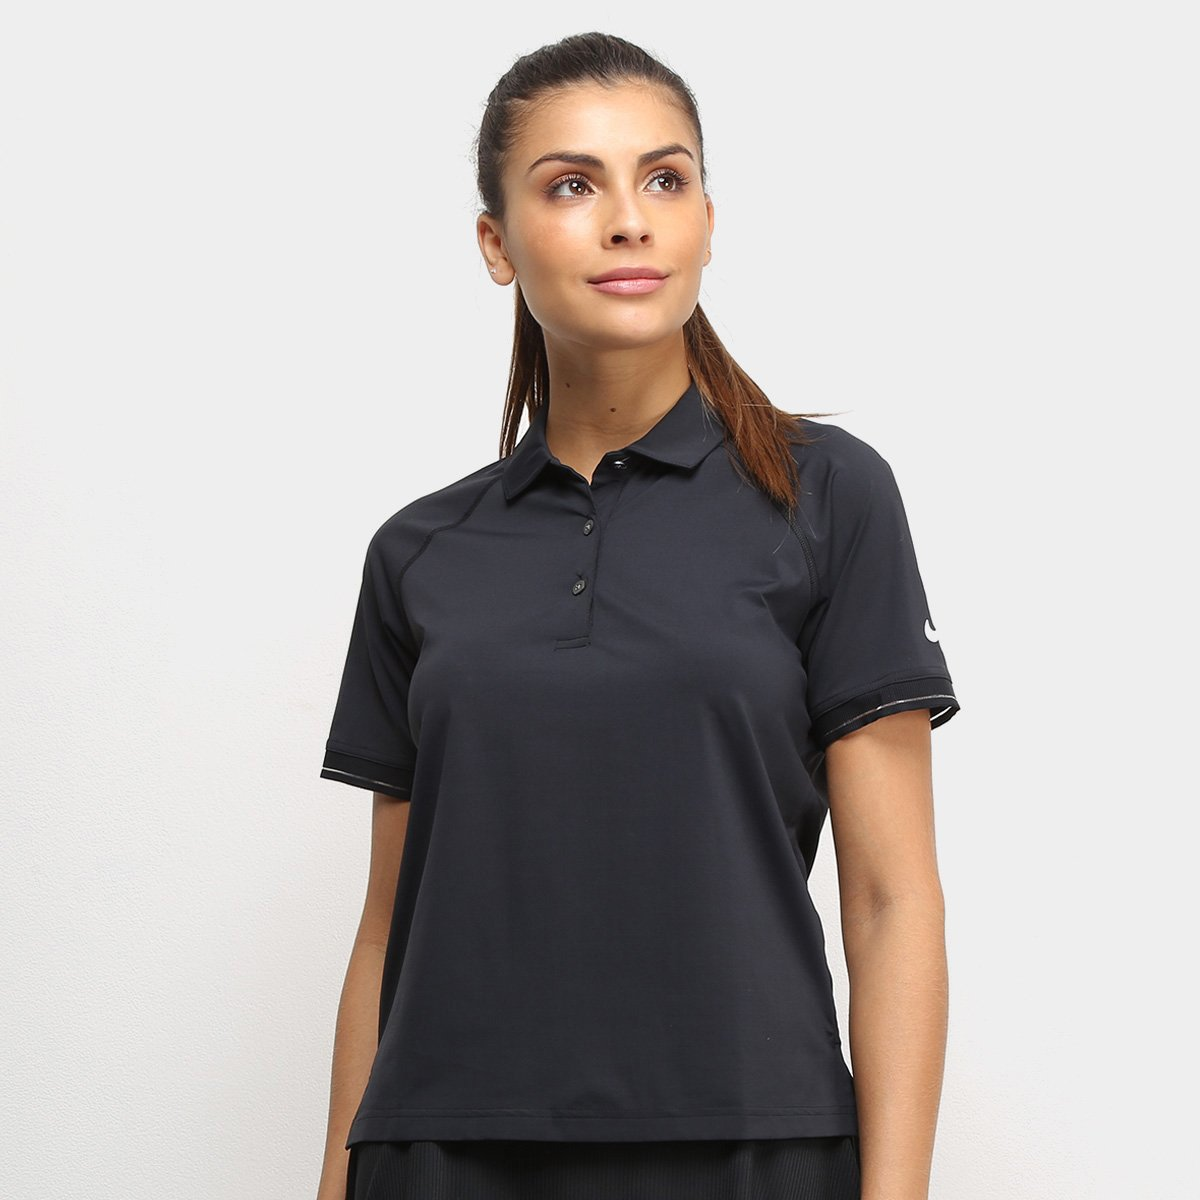 Camiseta Nike Feminina Polo Dry-Fit Court Essential Preta